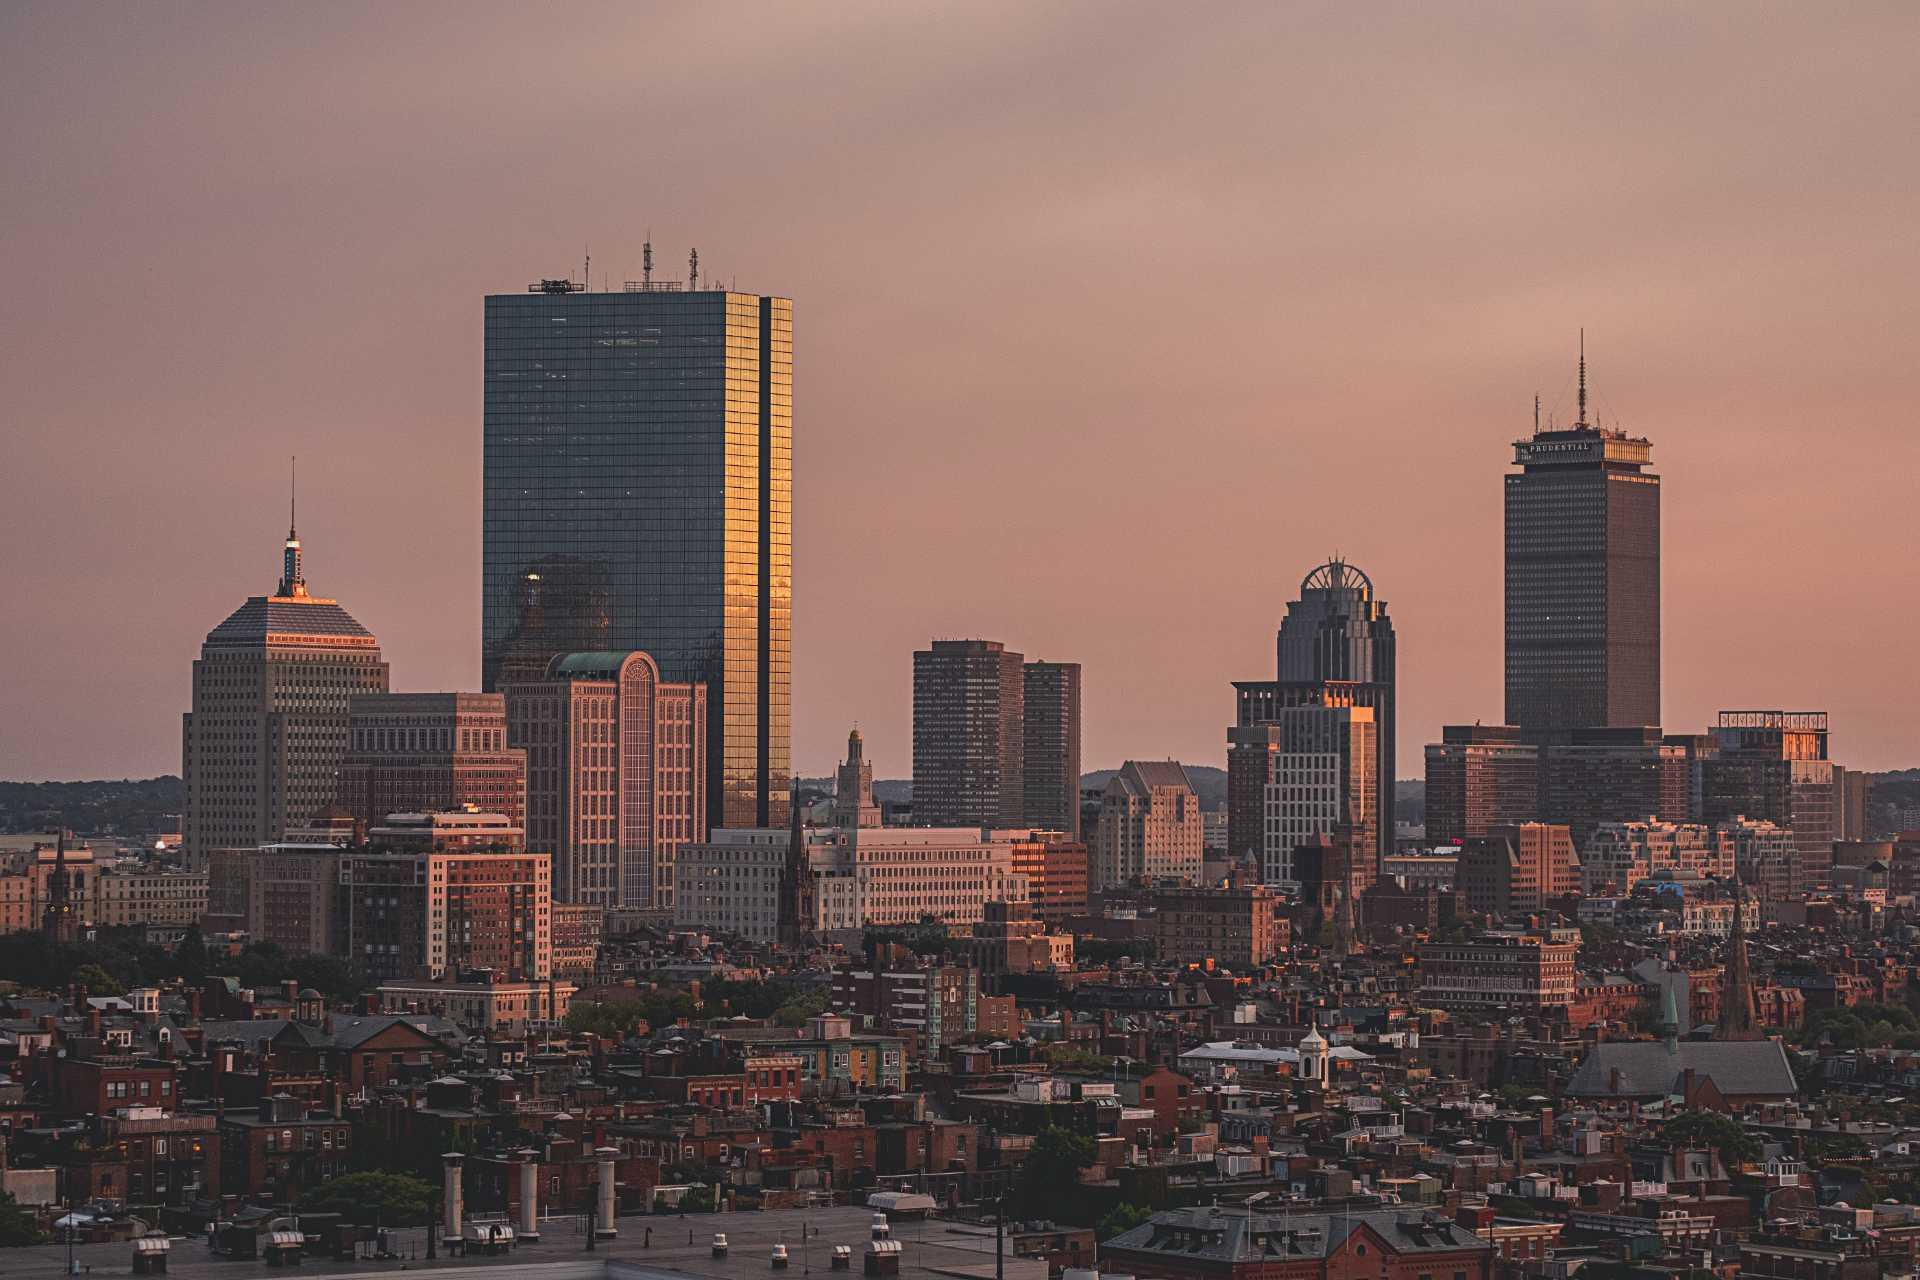 A skyline of downtown Boston. Photo courtesy of Osman Rana on Unsplash.